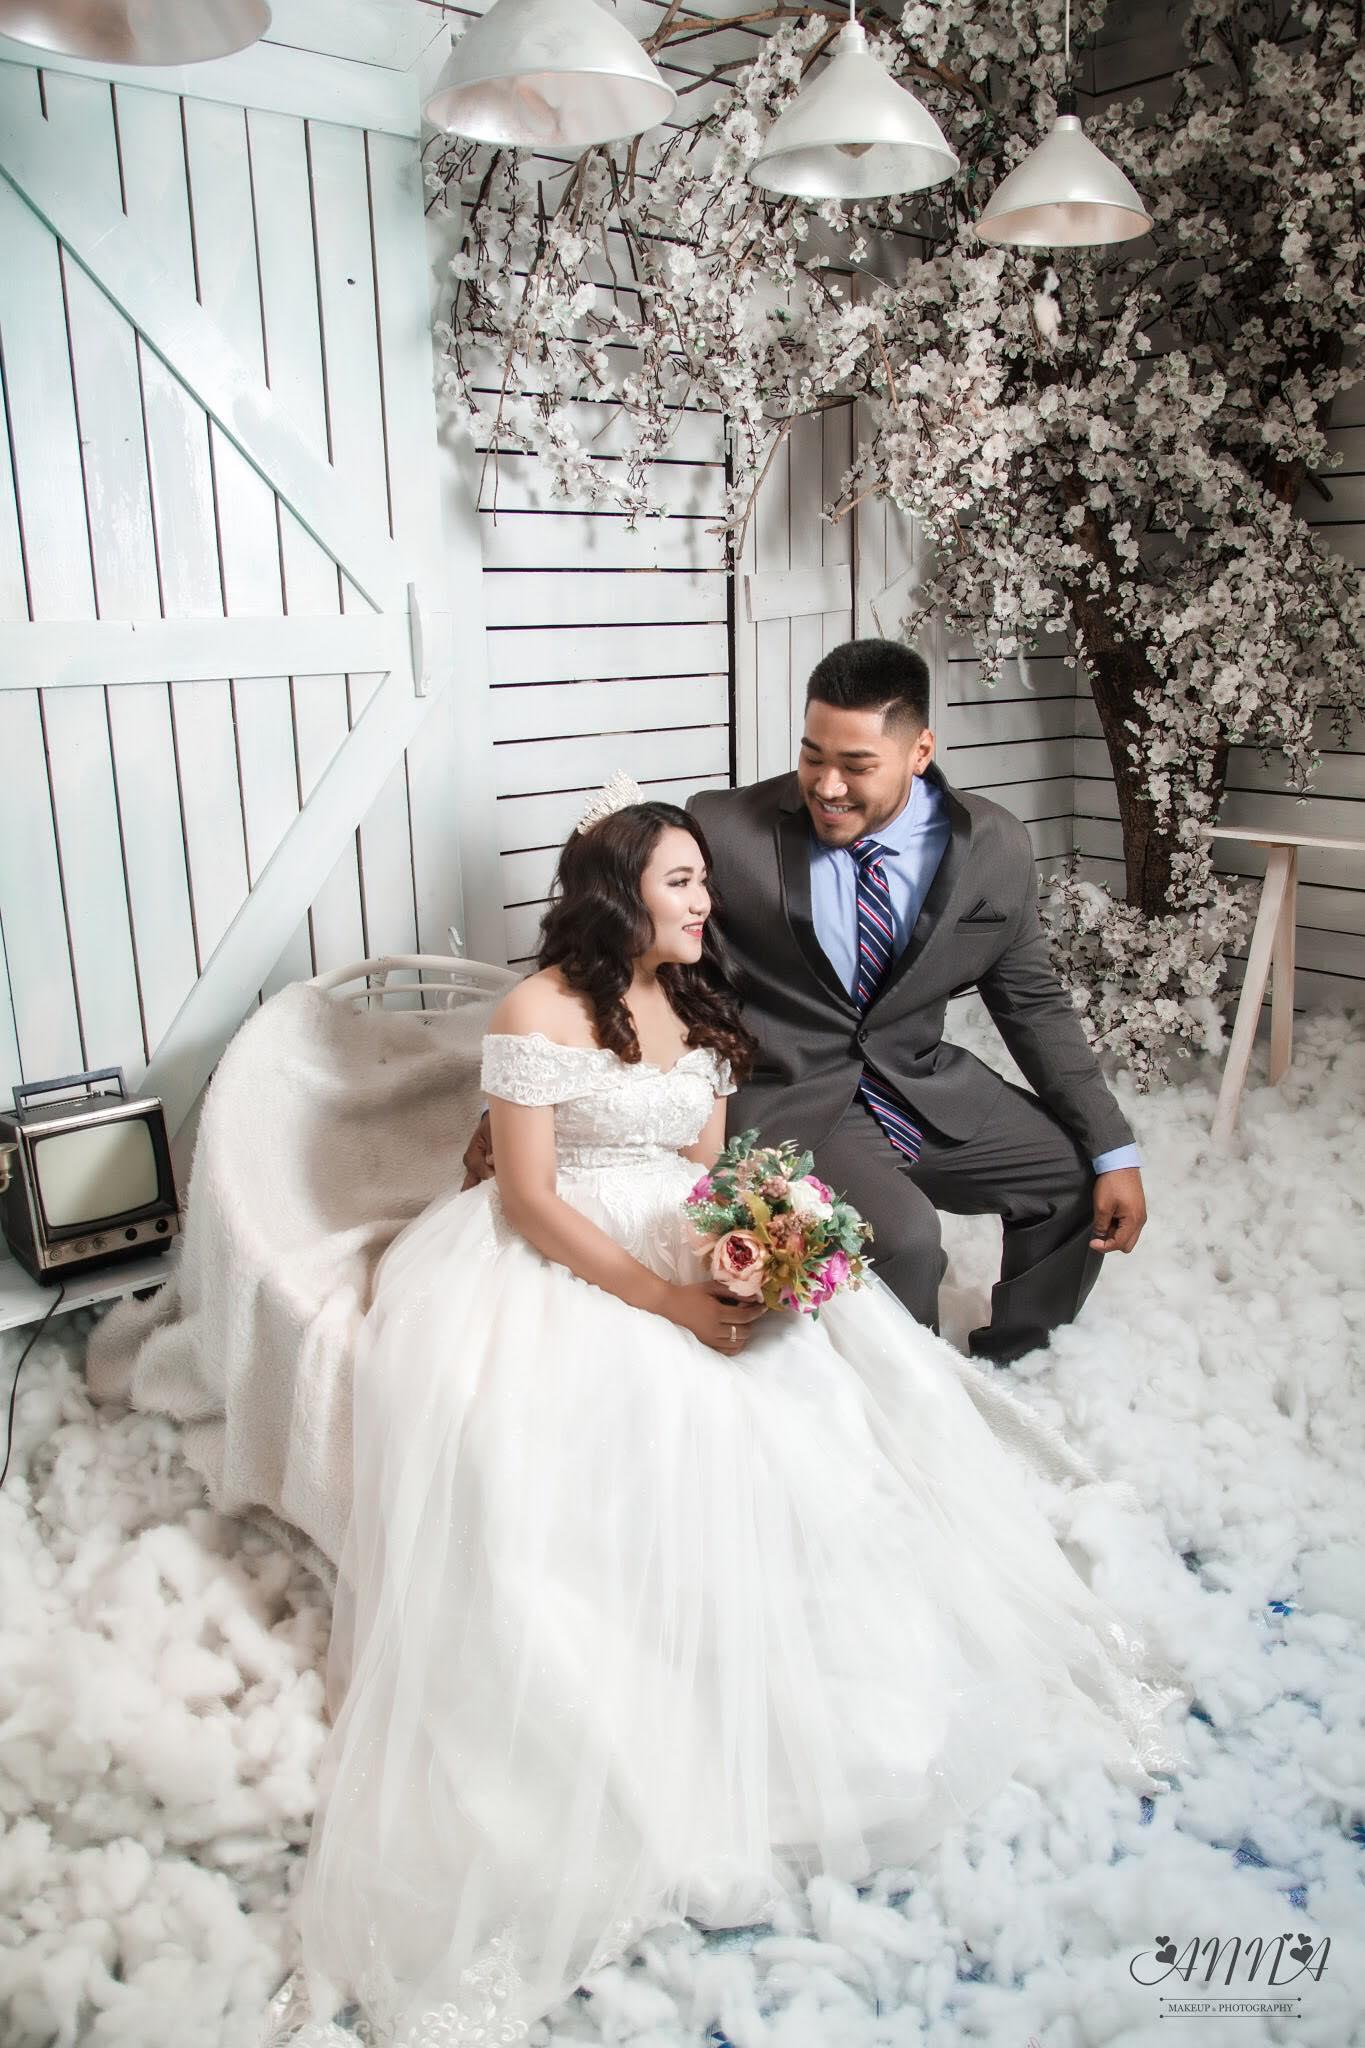 [PRE-WEDDING] MAI QUỲNH - ADRIAN ZAPATA